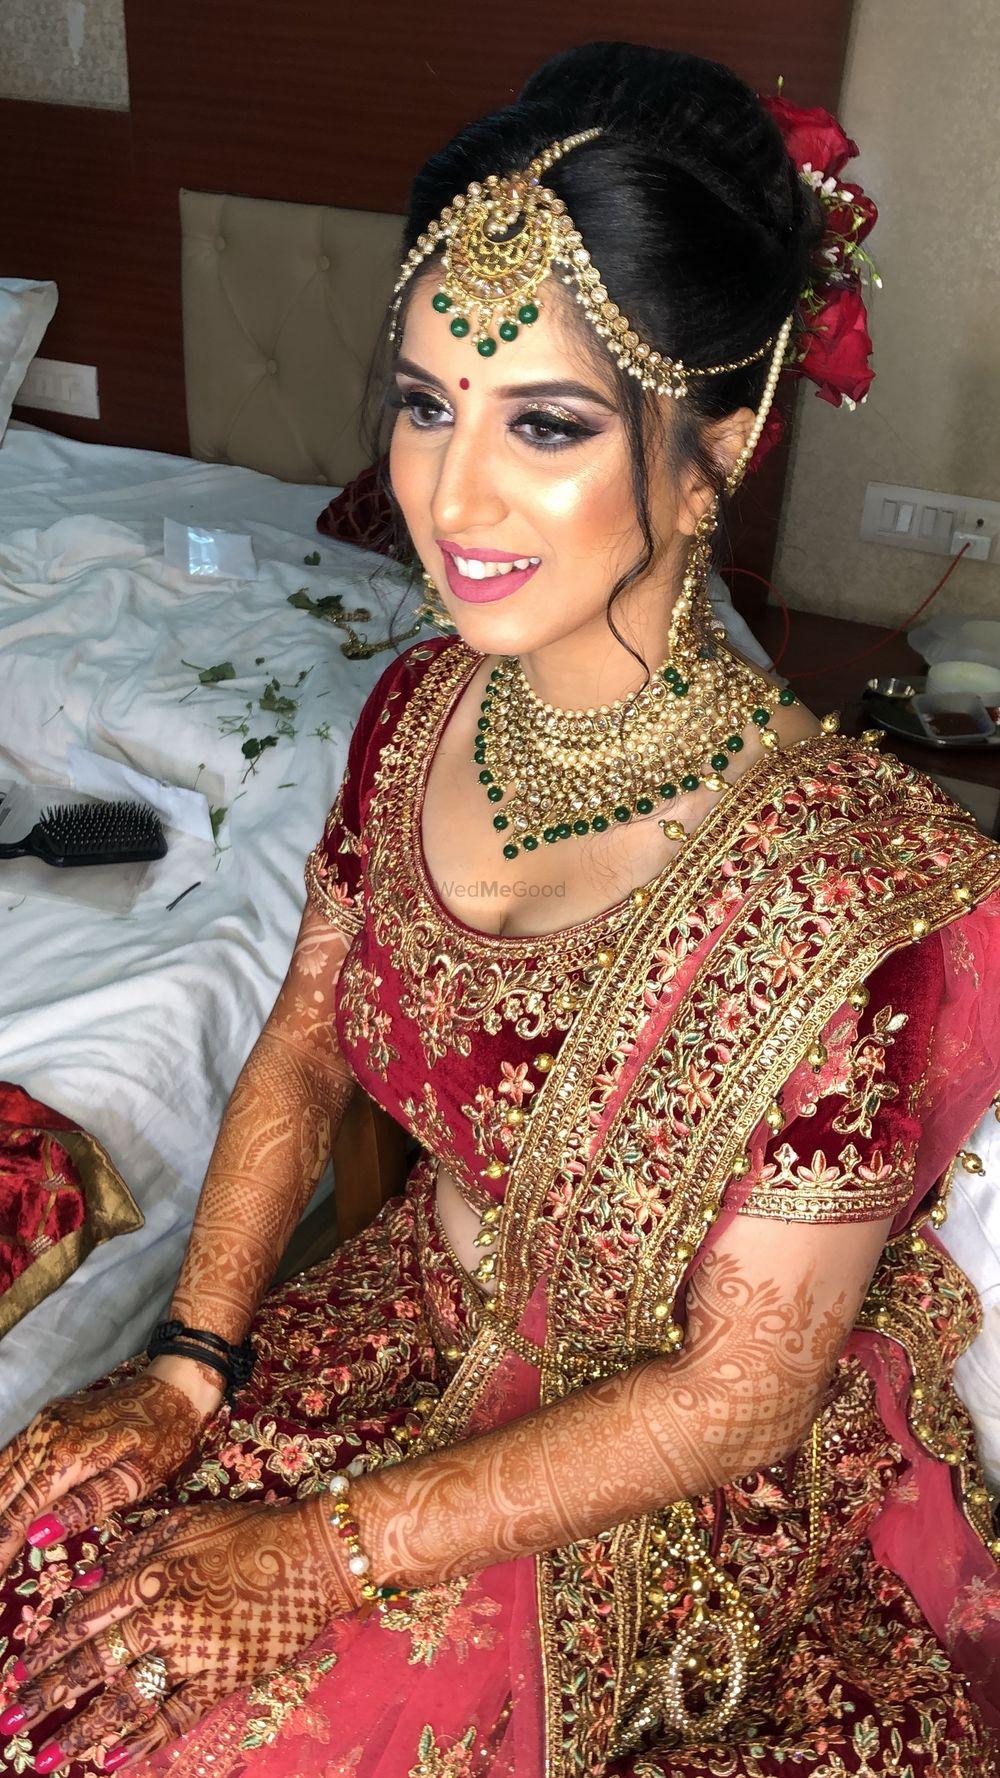 Photo From Bride Ankita - By Pinky Bhatia